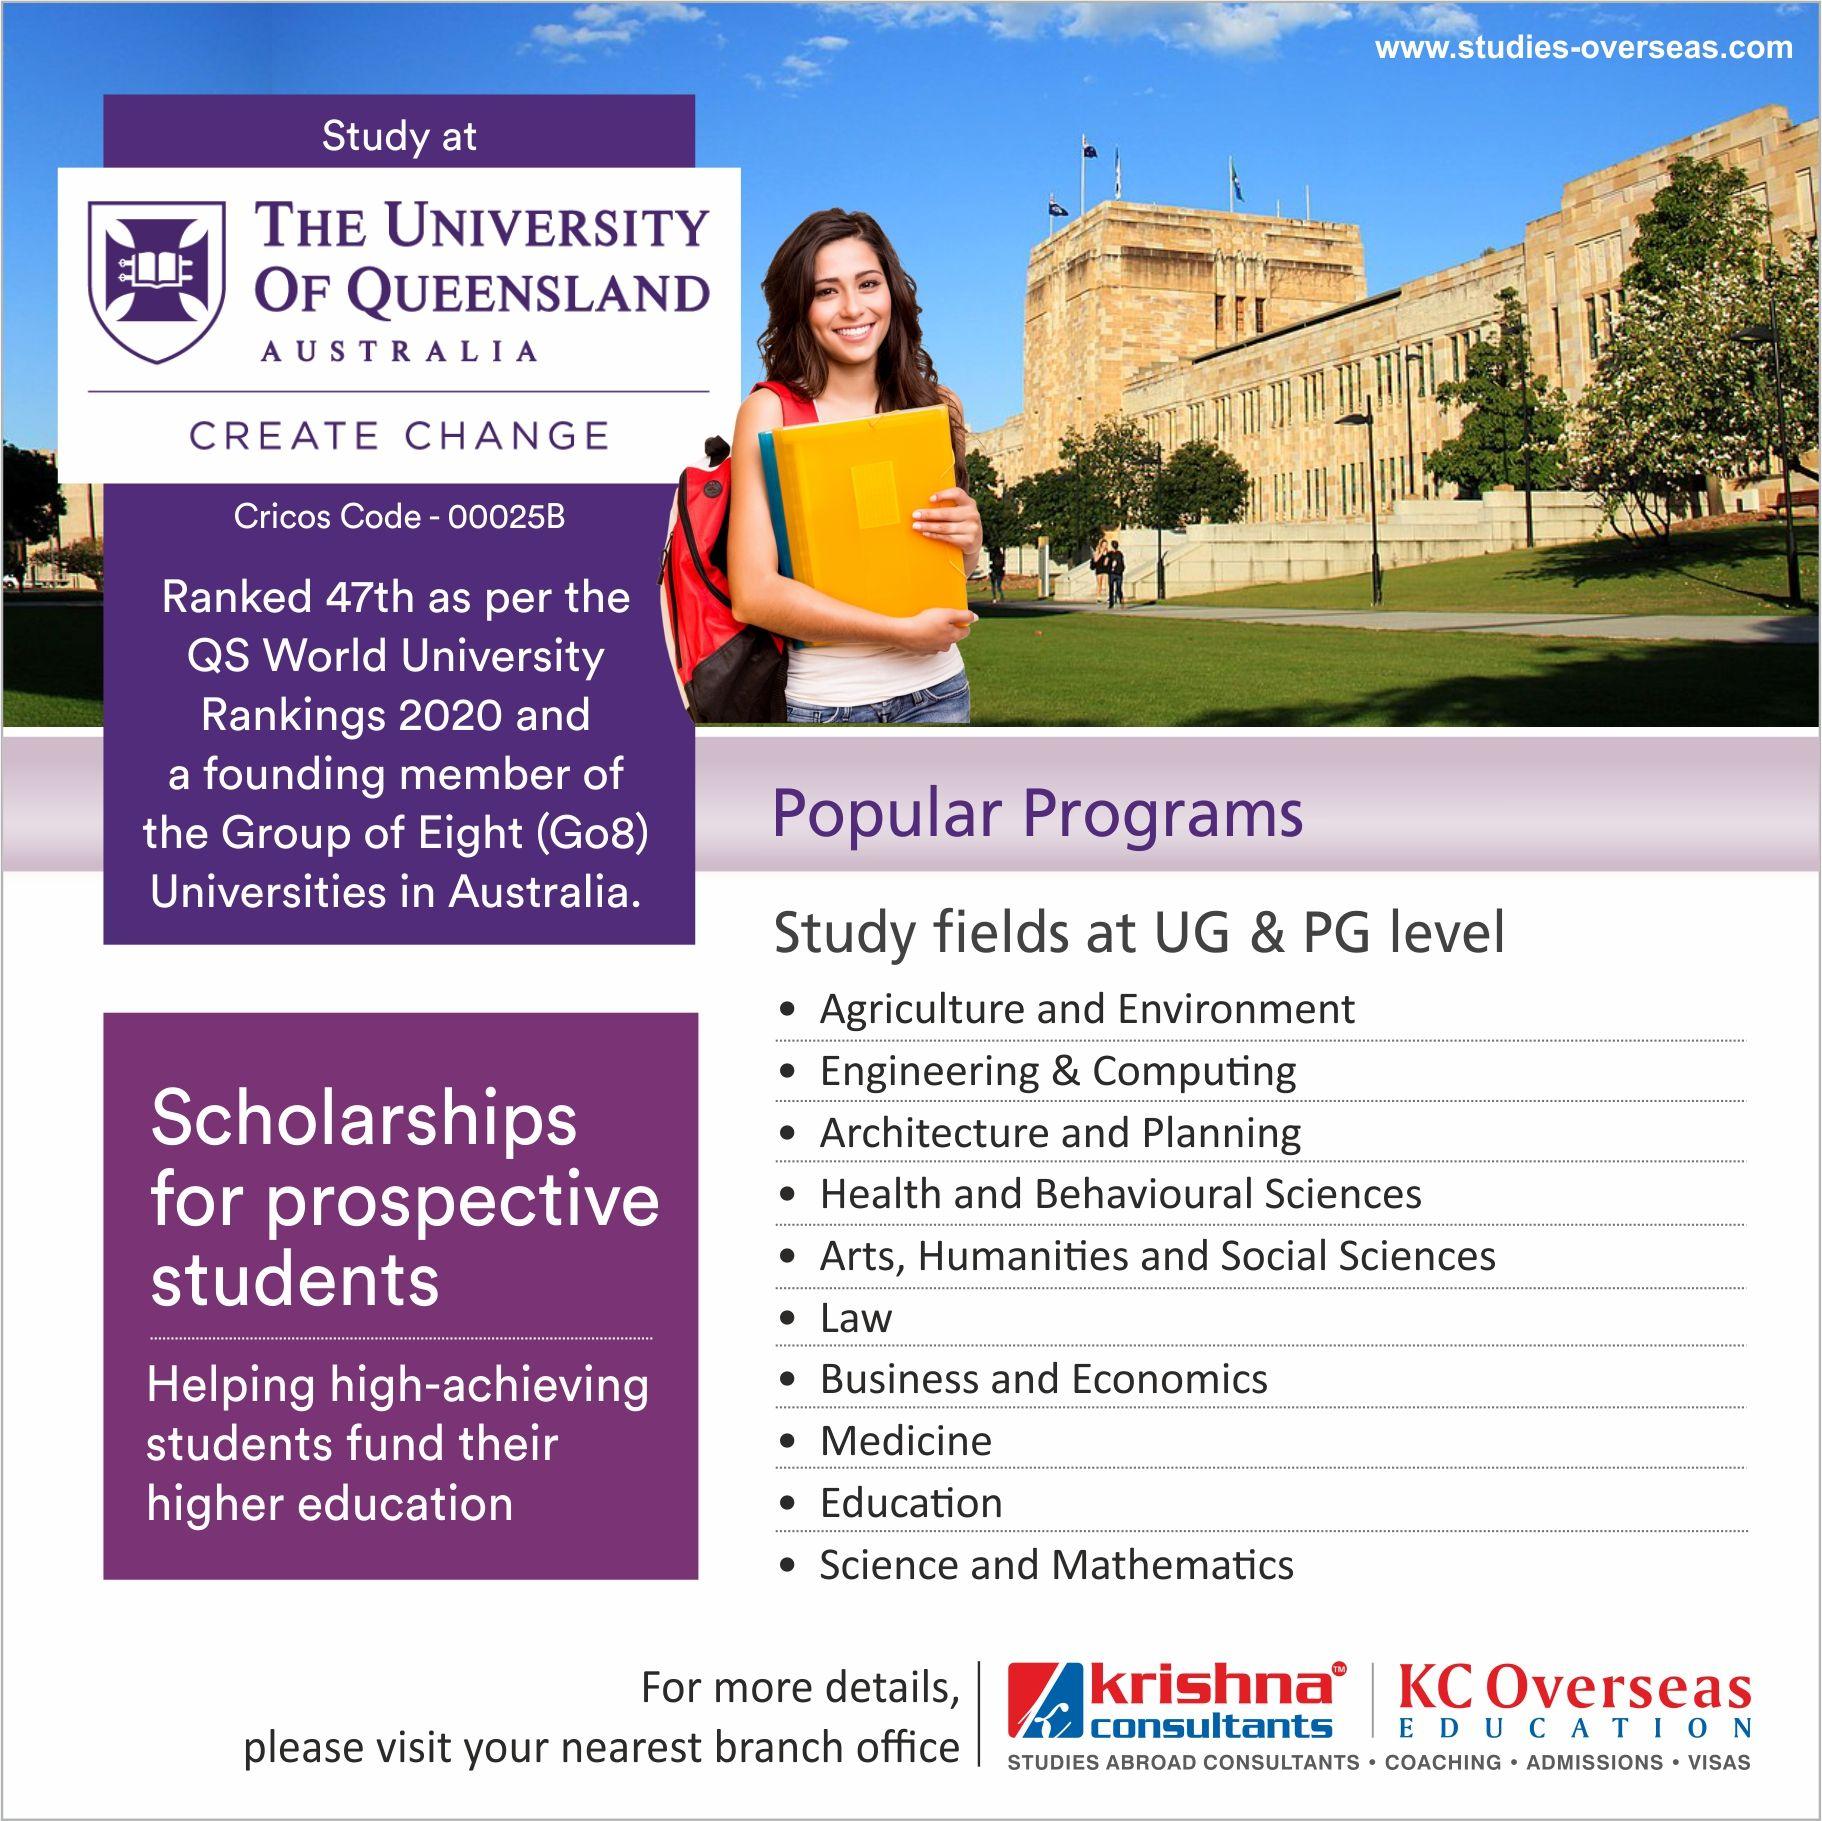 ca05d4dda9f0b043c01957d3282d11ed - Australian University Application Deadline 2020